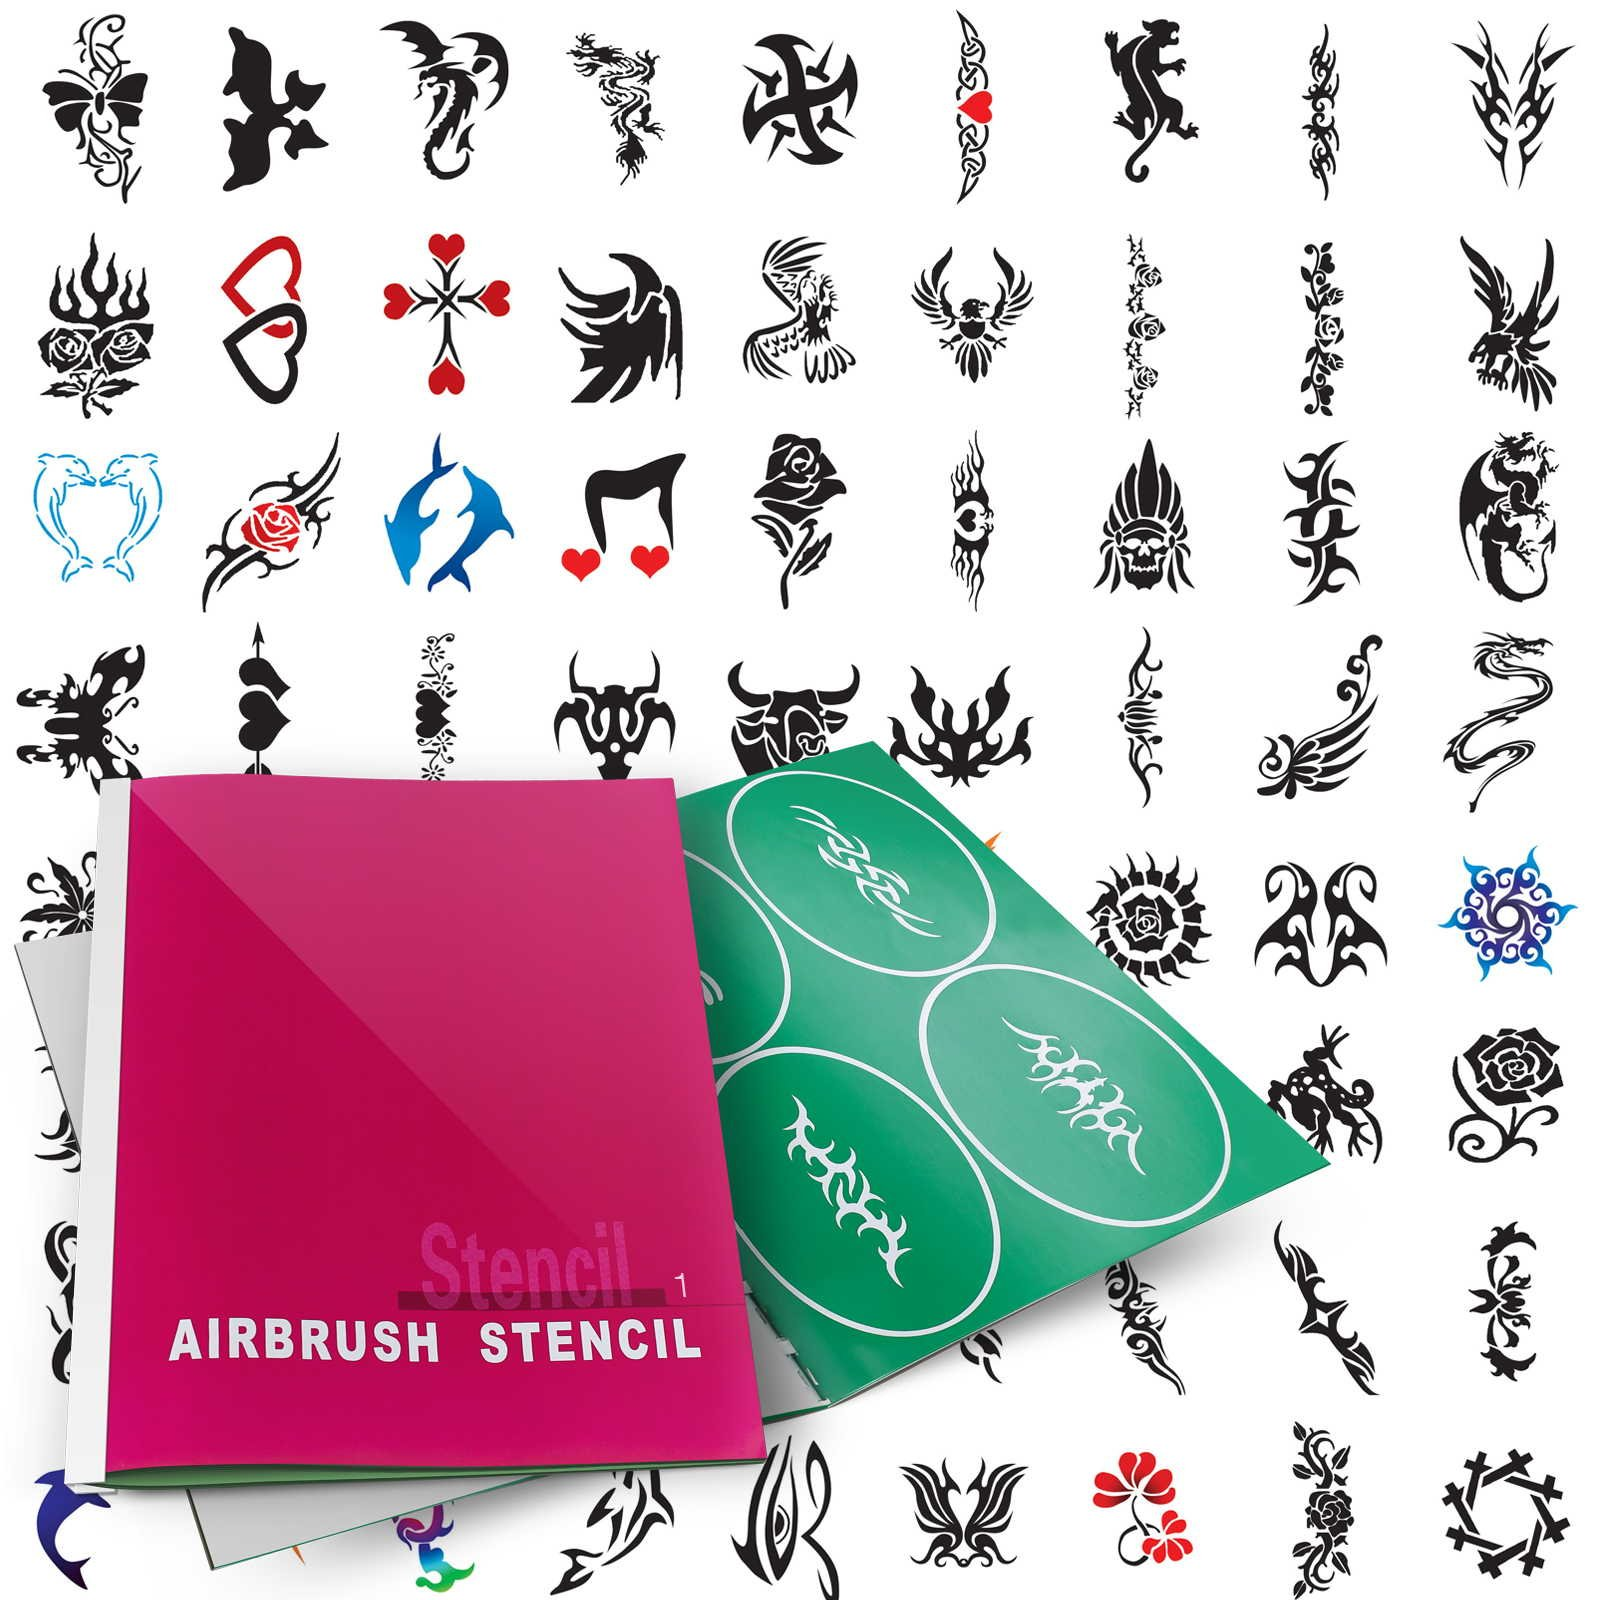 PointZero Temporary Tattoo Airbrush Stencils 100 Designs - Book 1